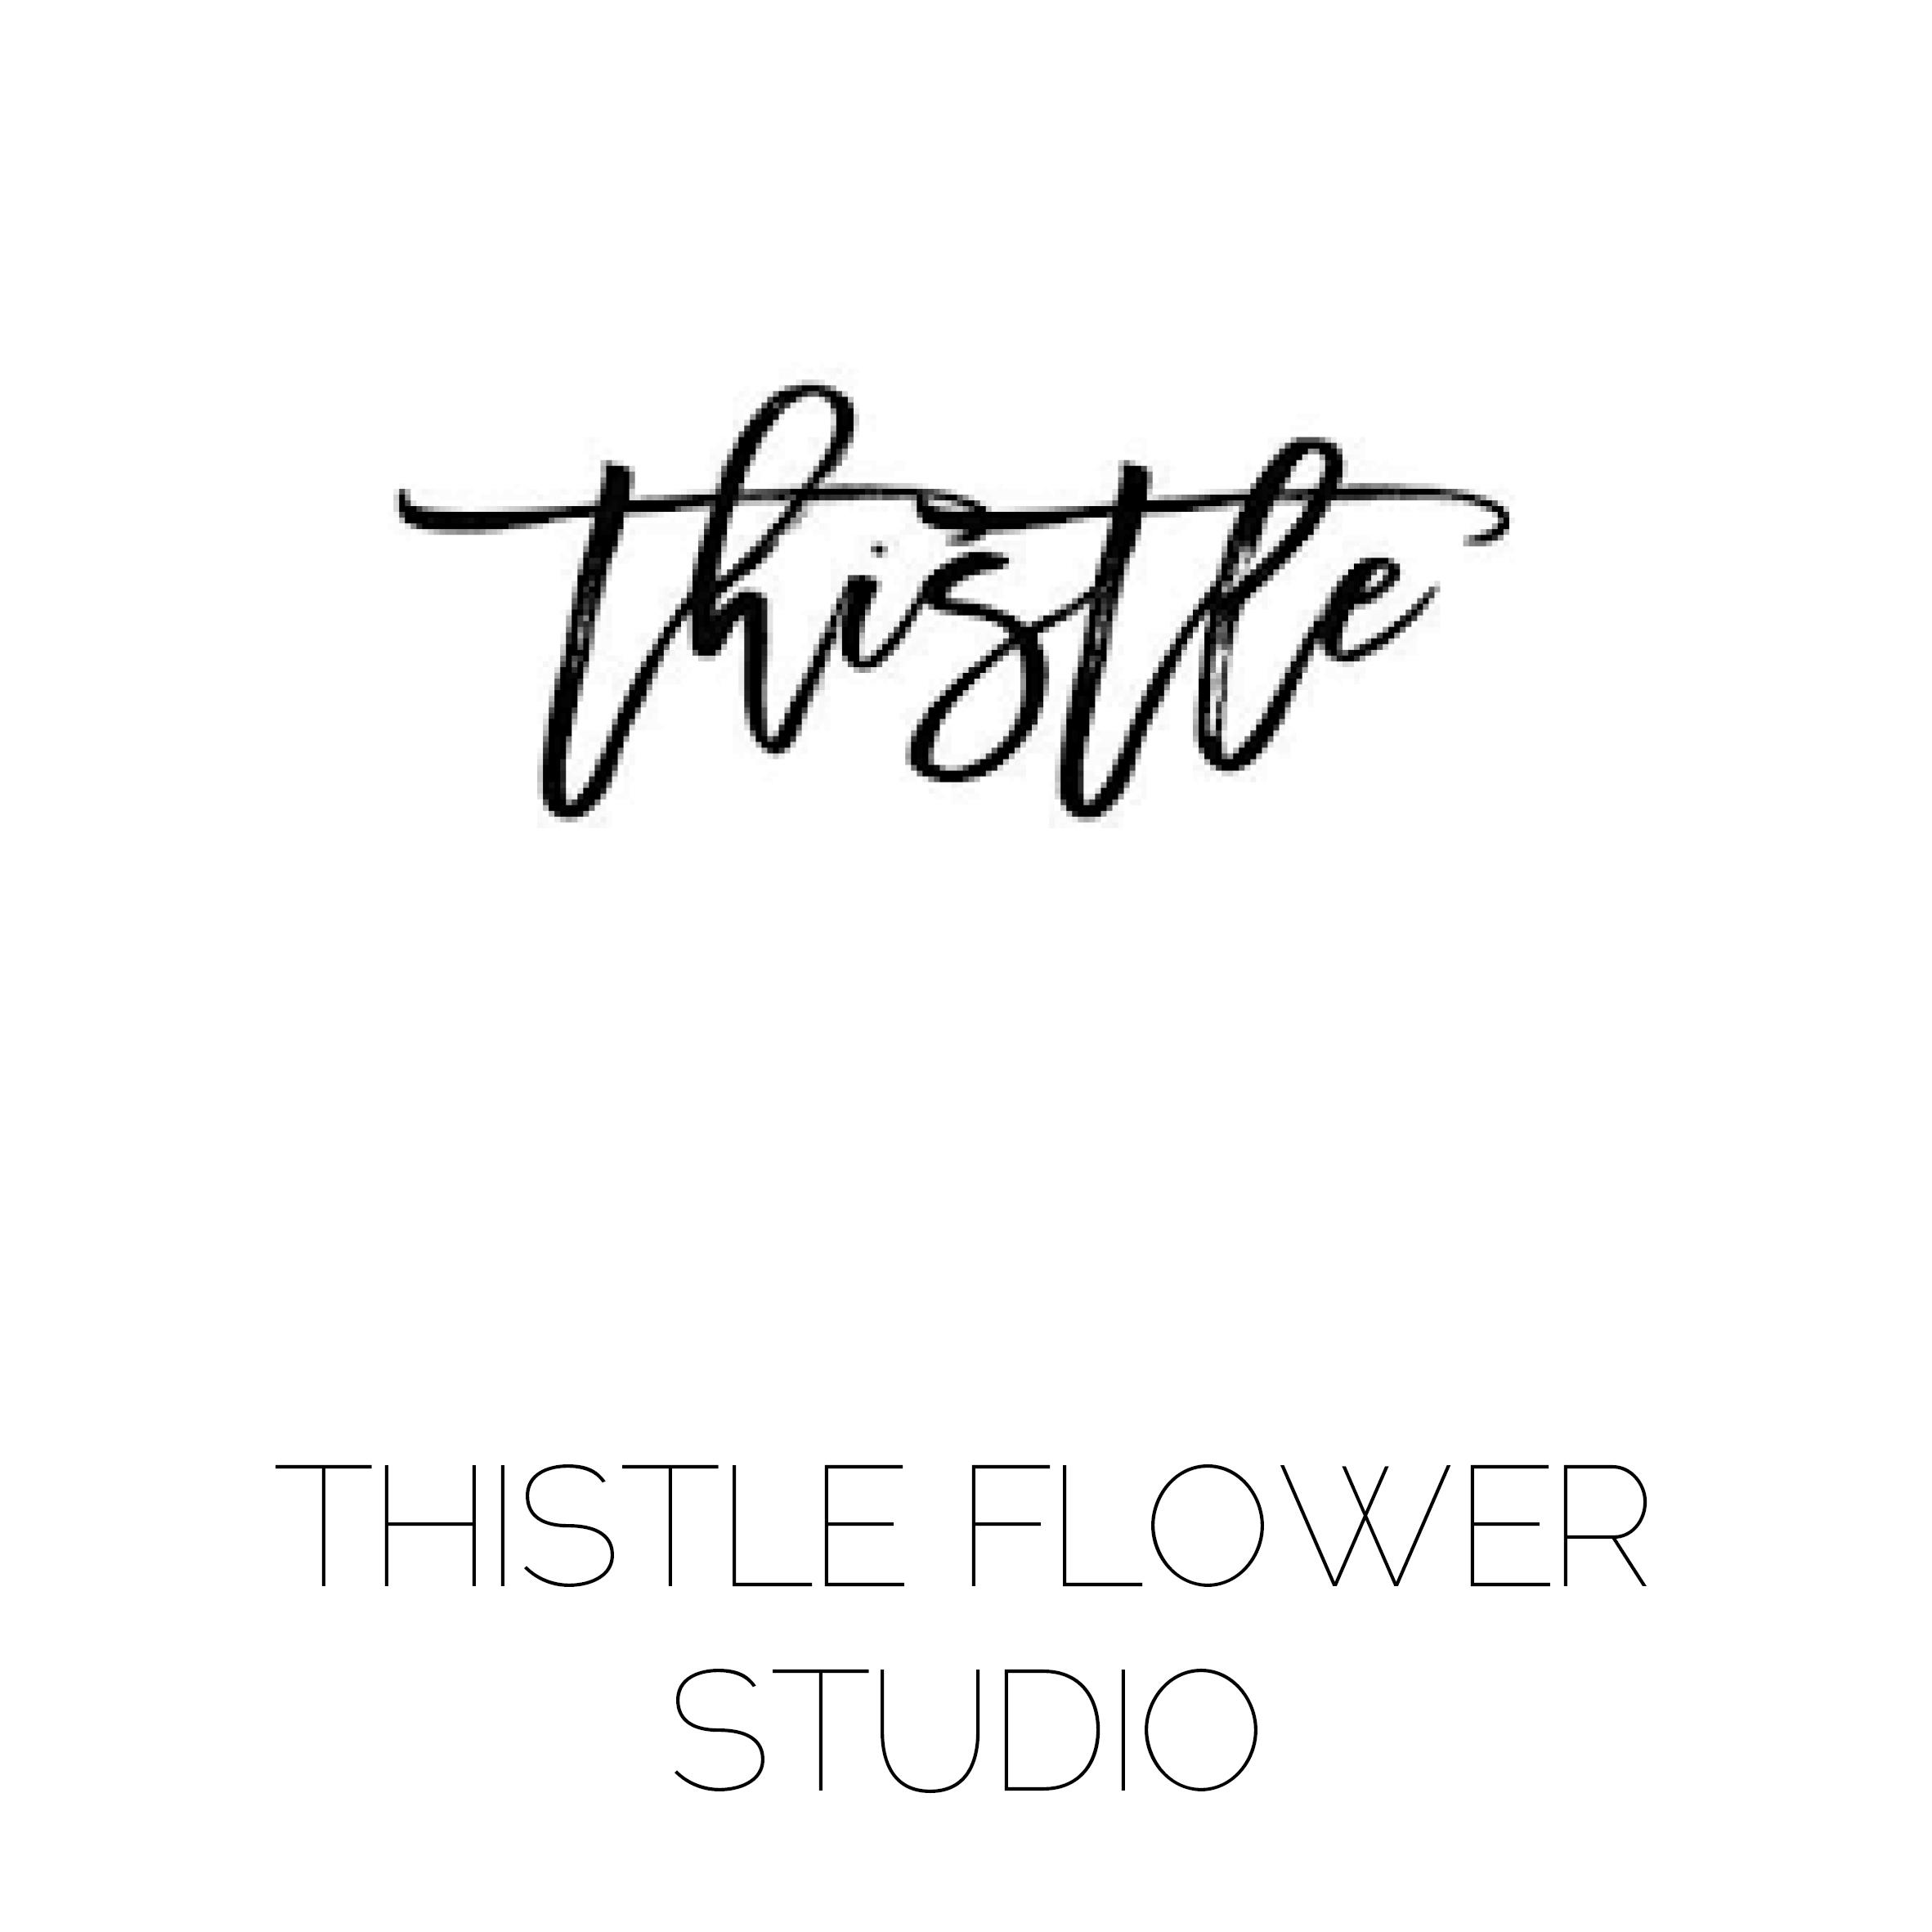 ThistleFlowerStudio.jpg